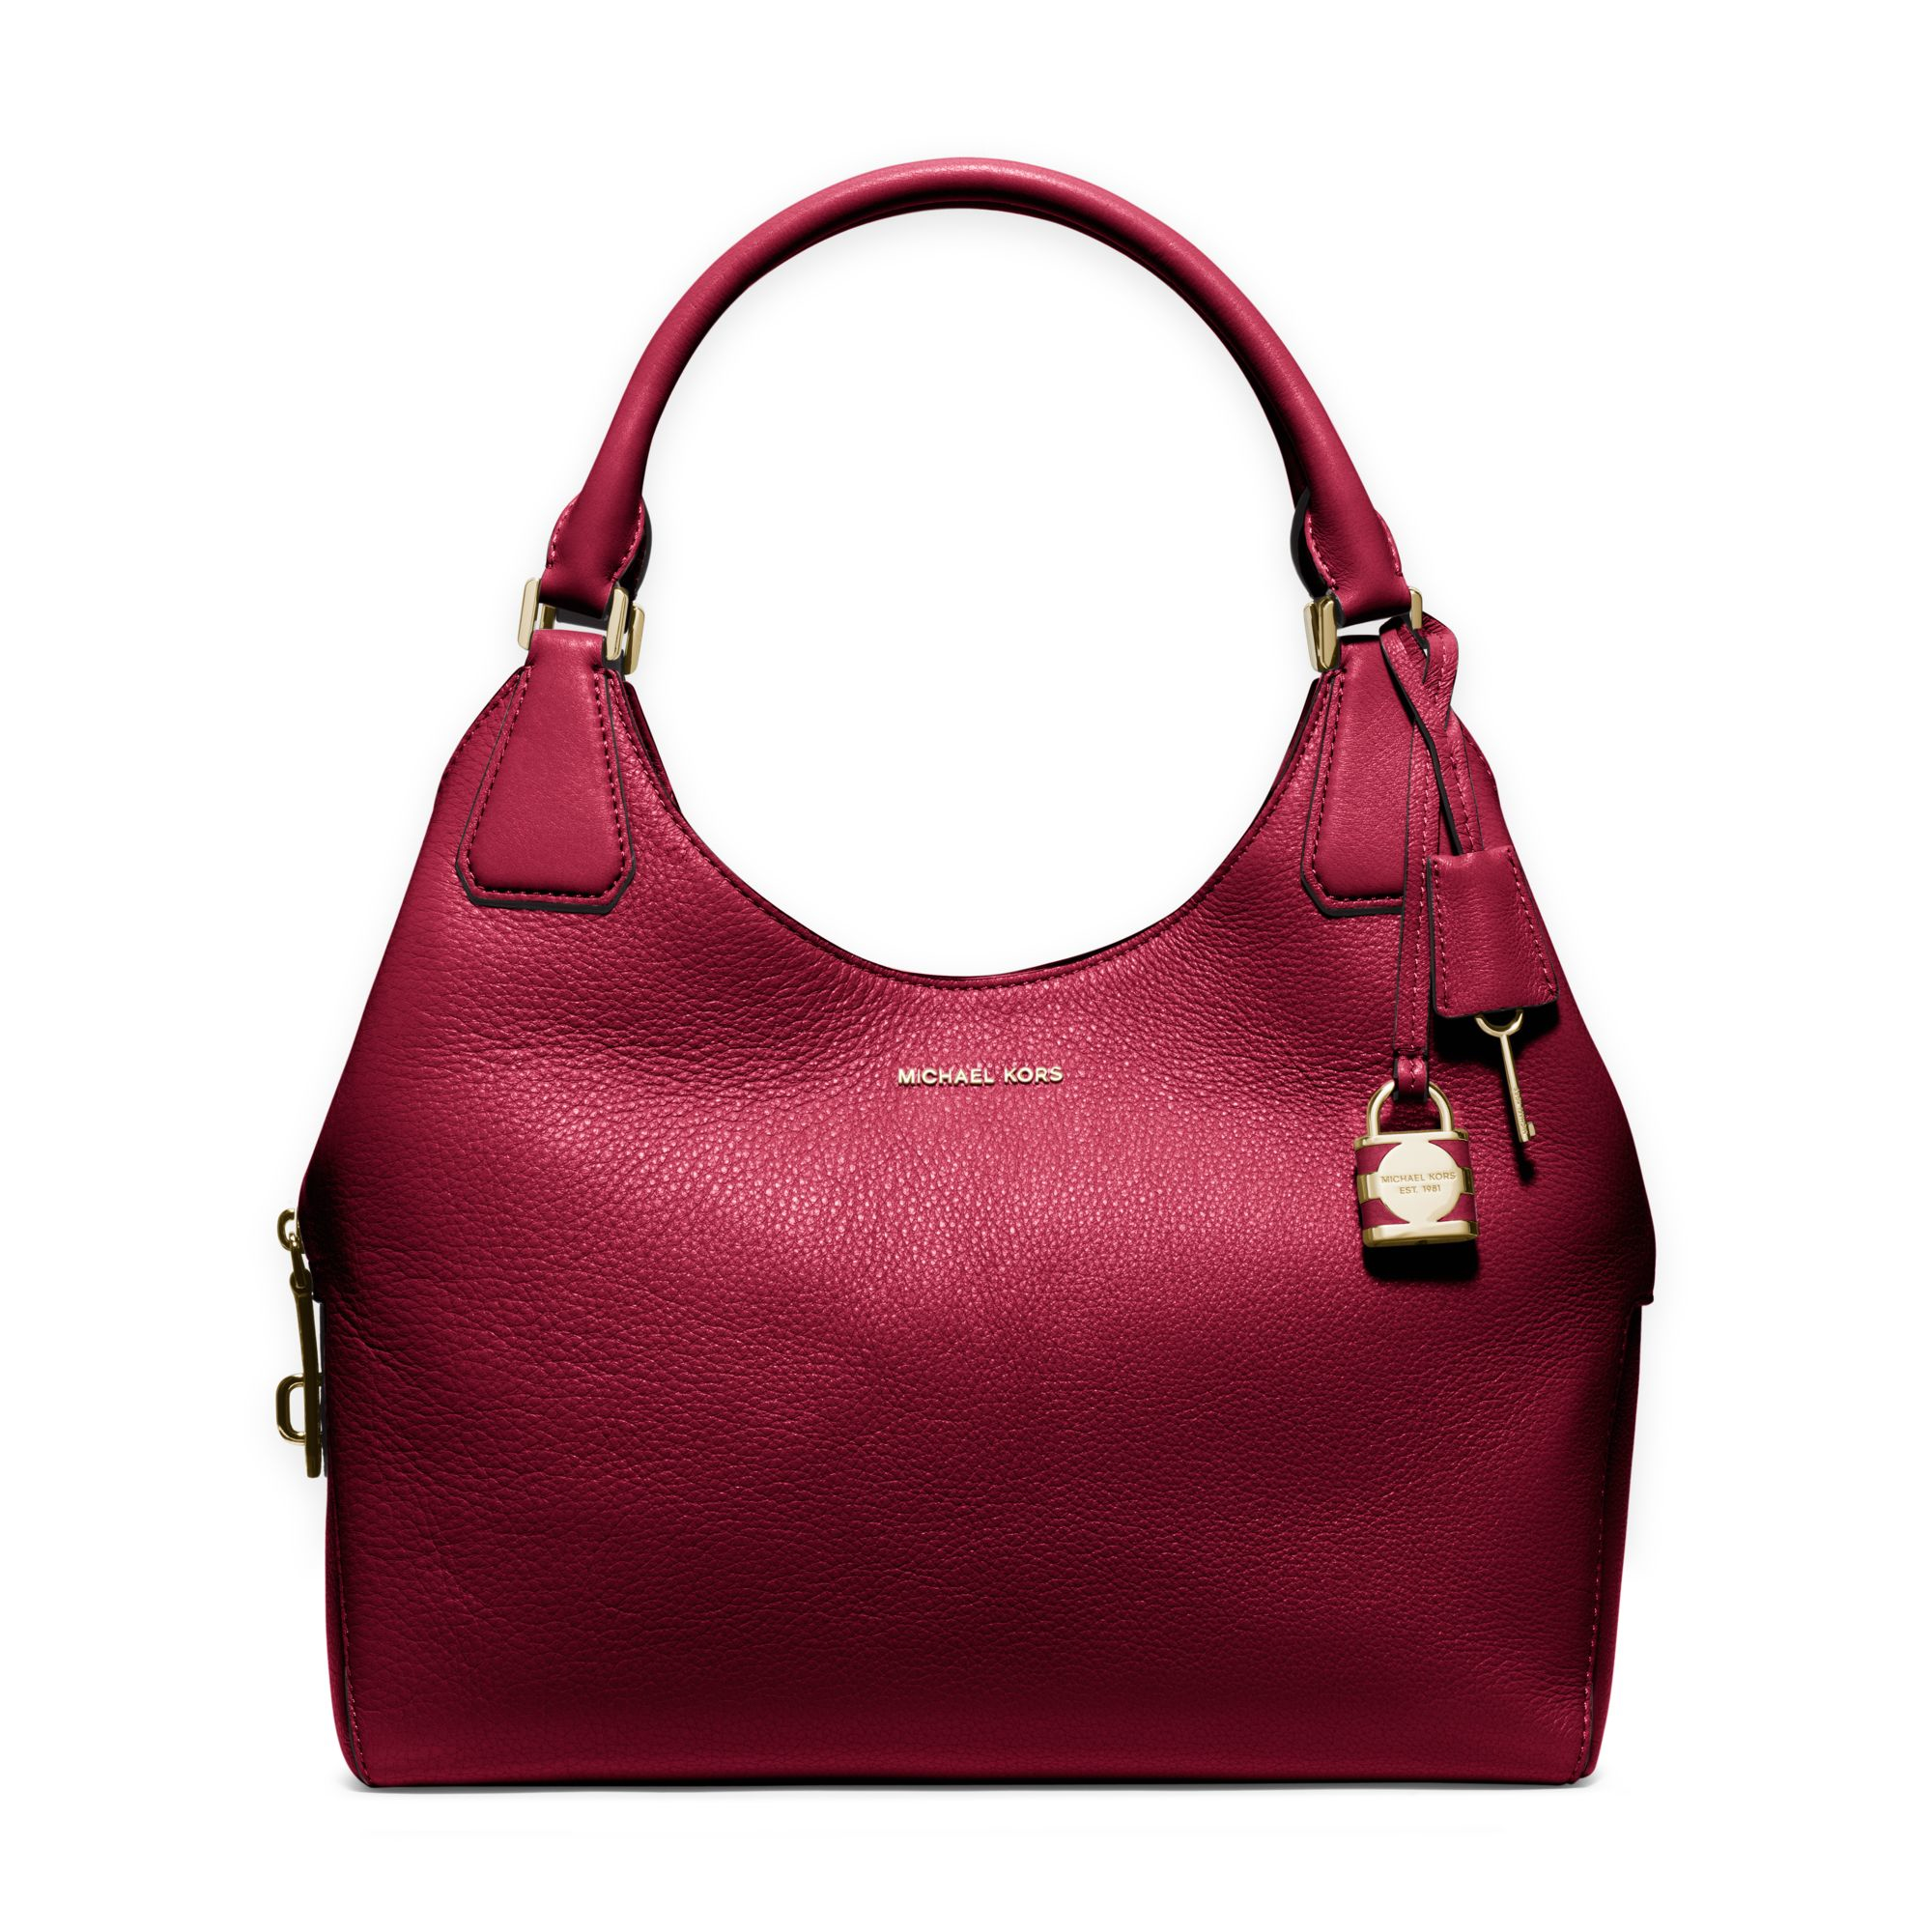 Michael kors Camille Large Leather Shoulder Bag in Red | Lyst